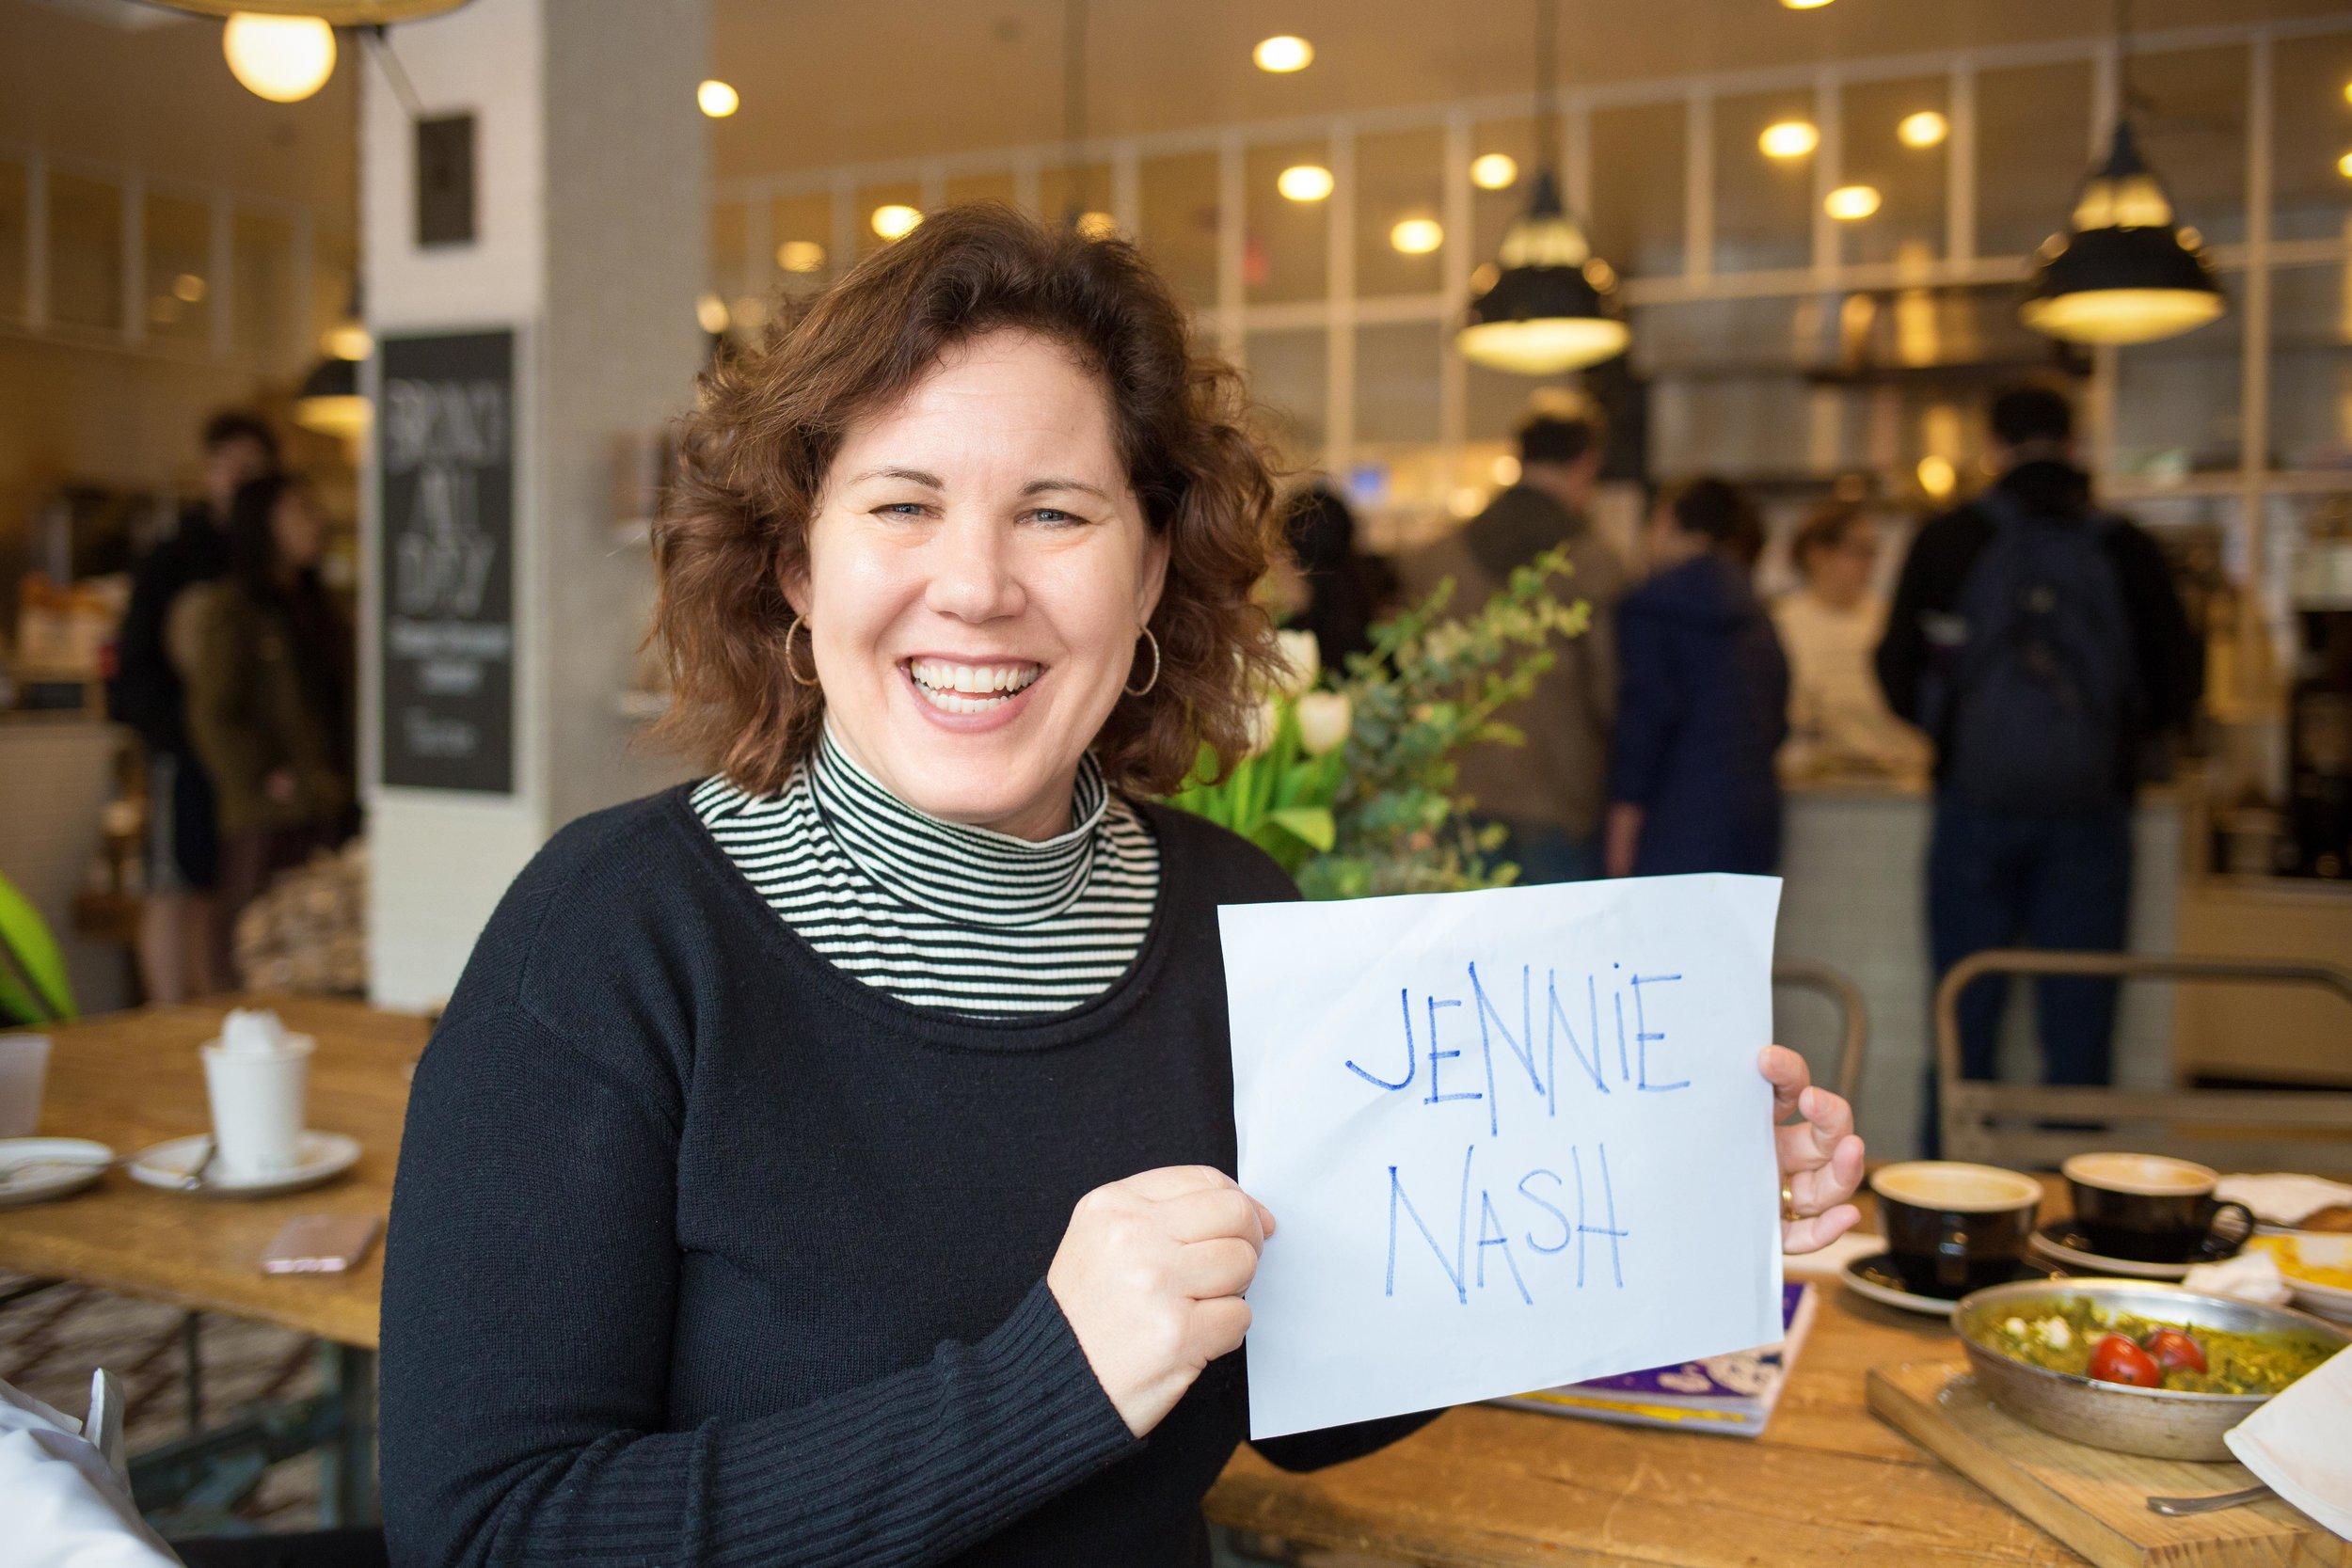 Jennie - holding the